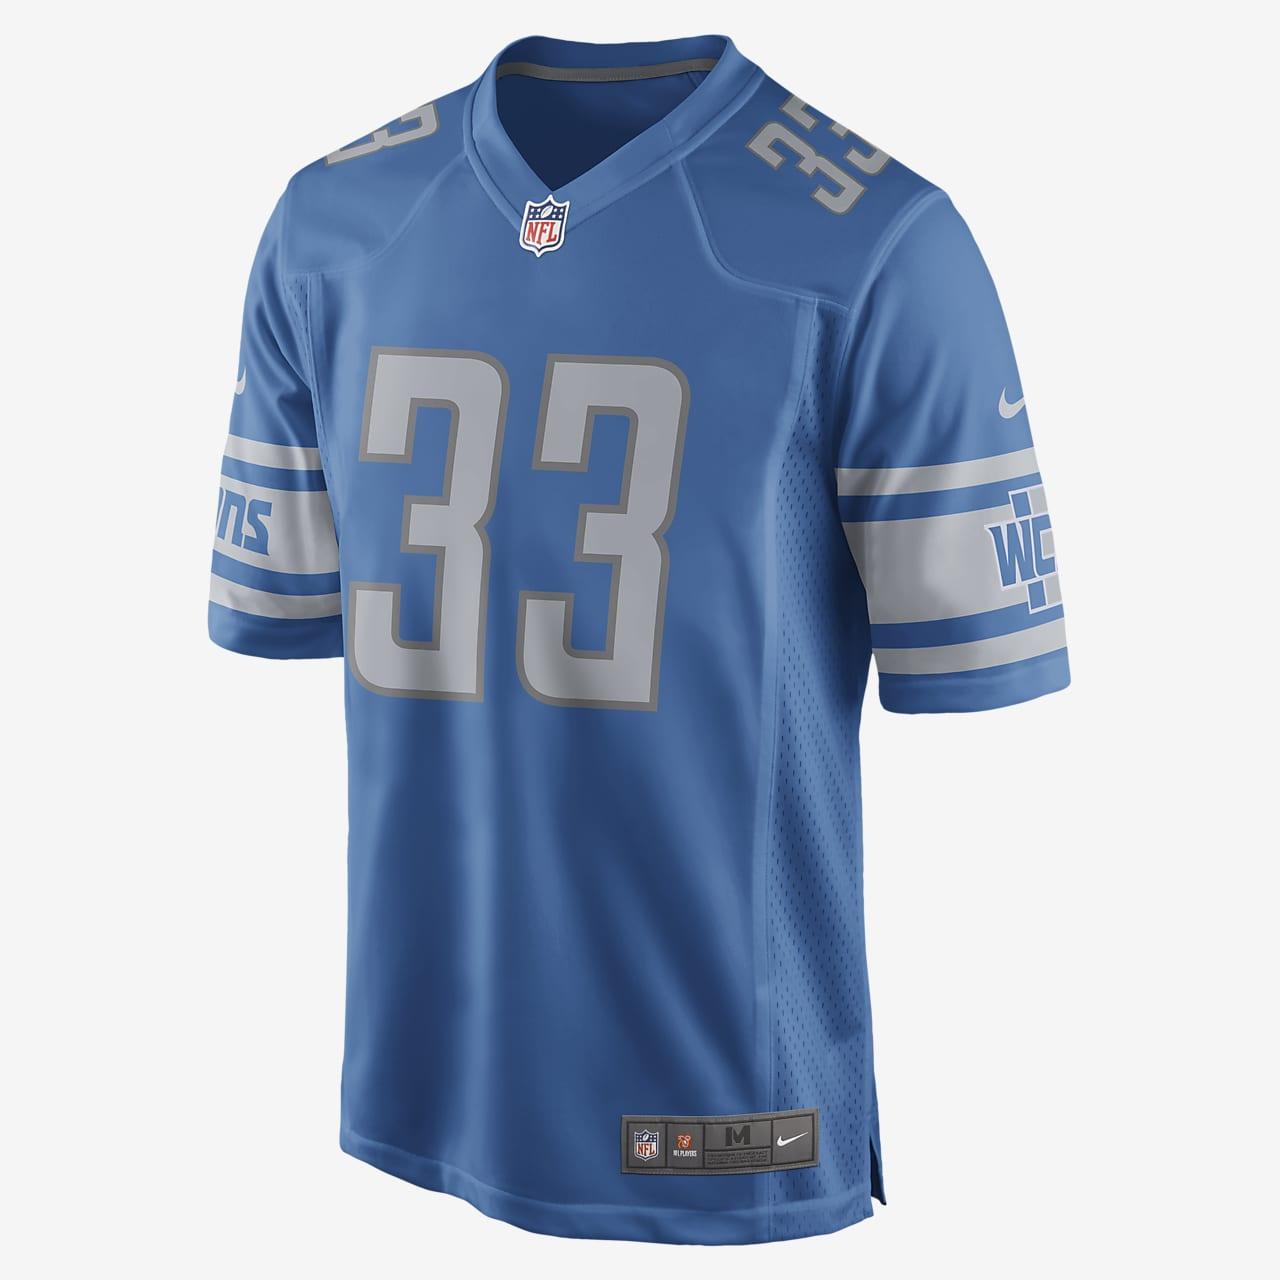 NFL Detroit Lions (Kerryon Johnson) Men's Game Football Jersey